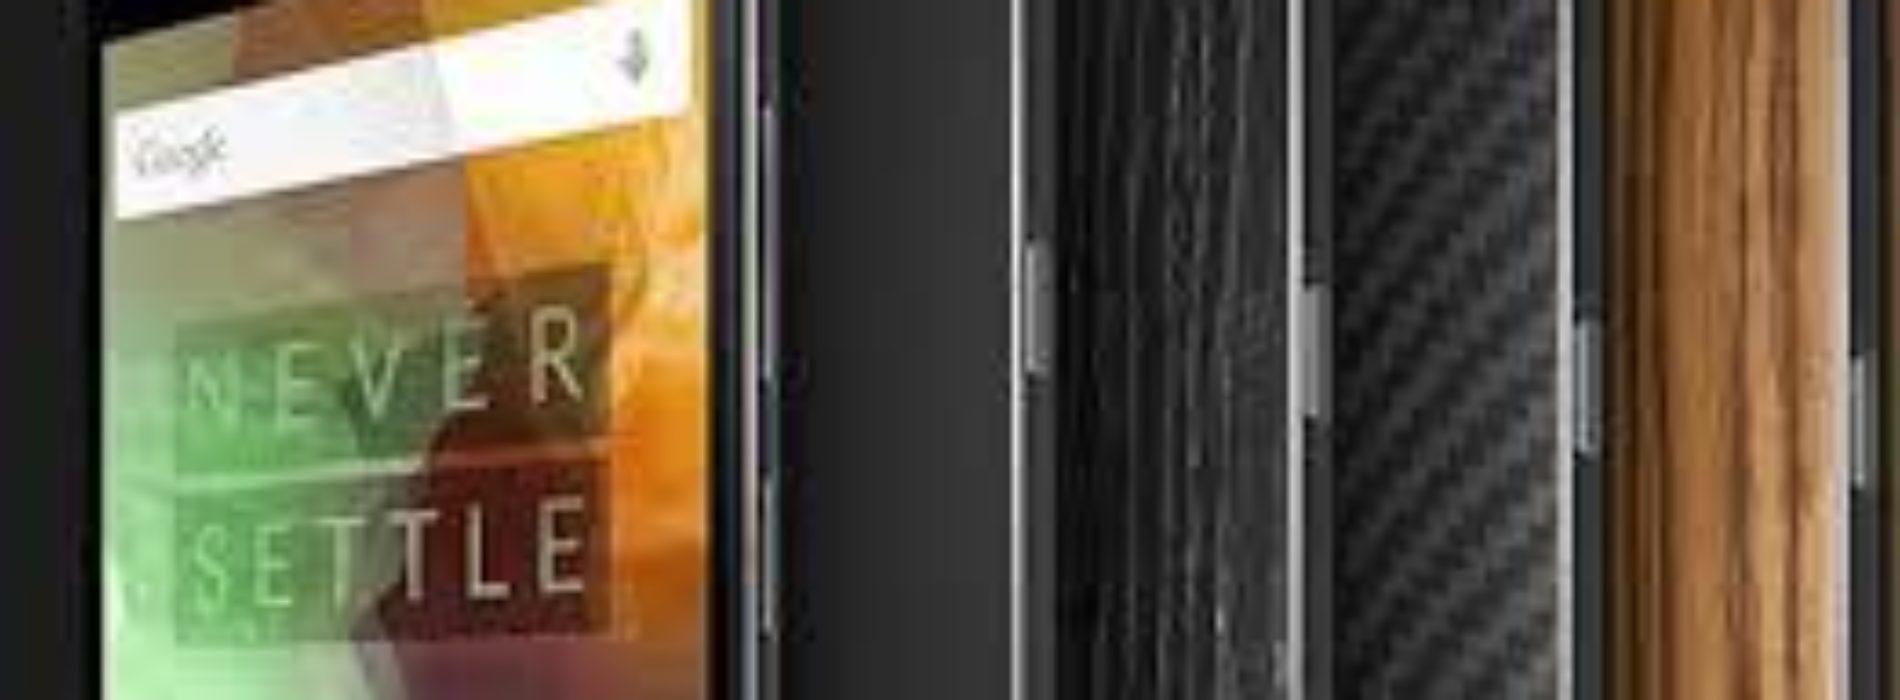 OnePlus 3, potencia a toda prueba